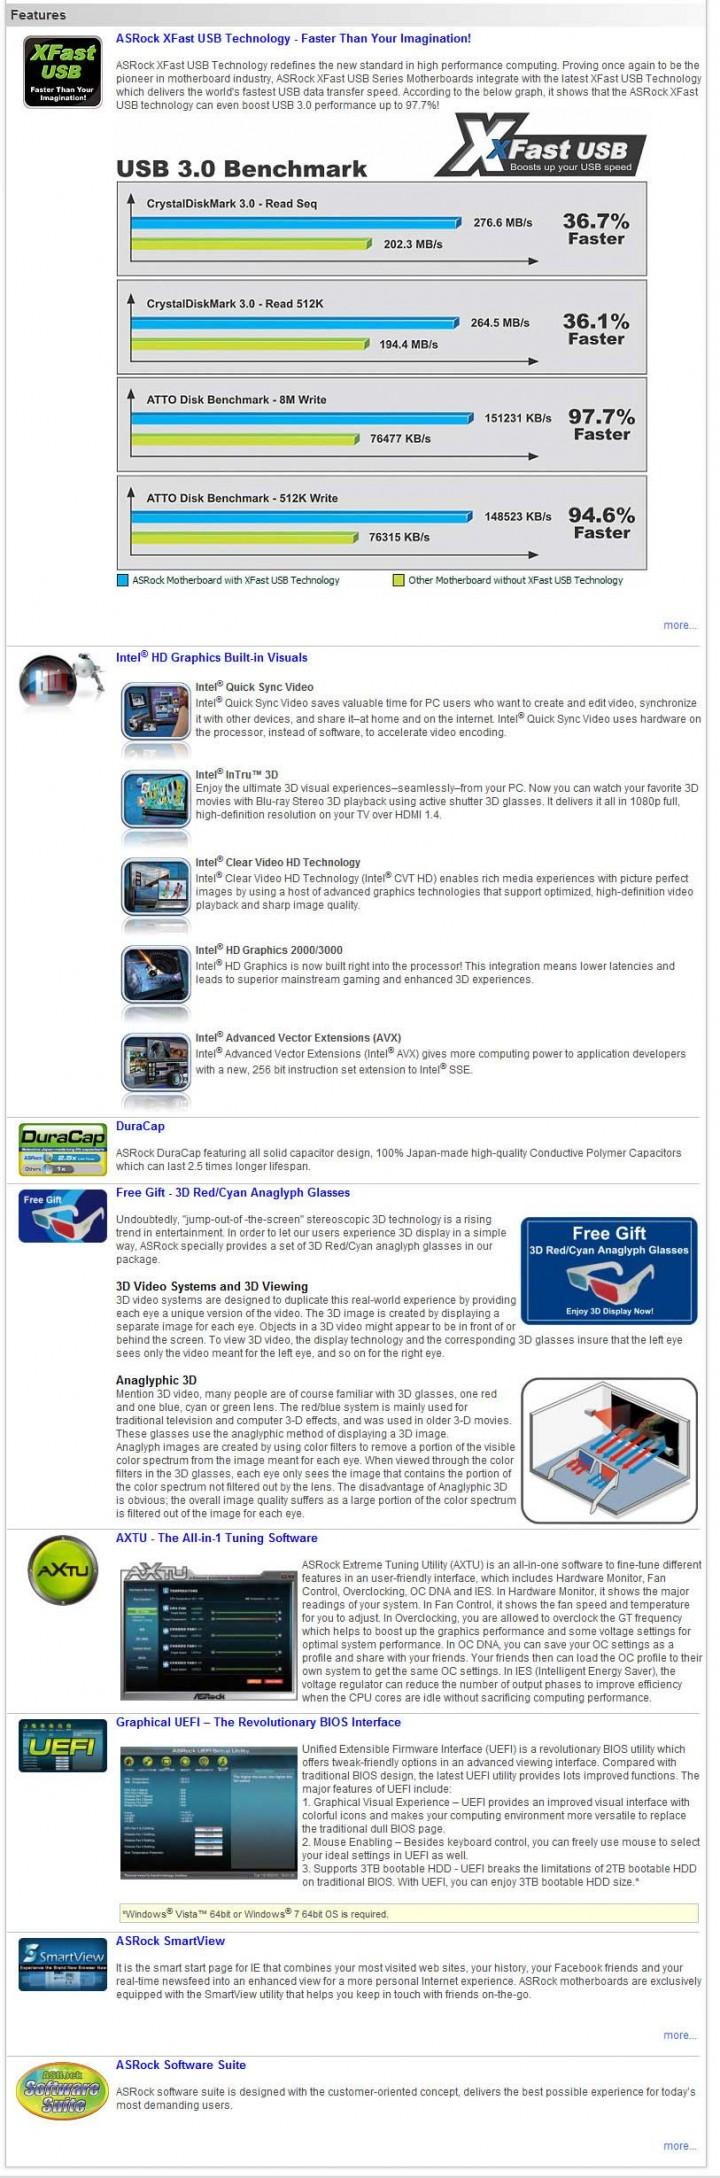 asrock h67m itx 01 720x2178 custom ASRock H67M ITX : Review